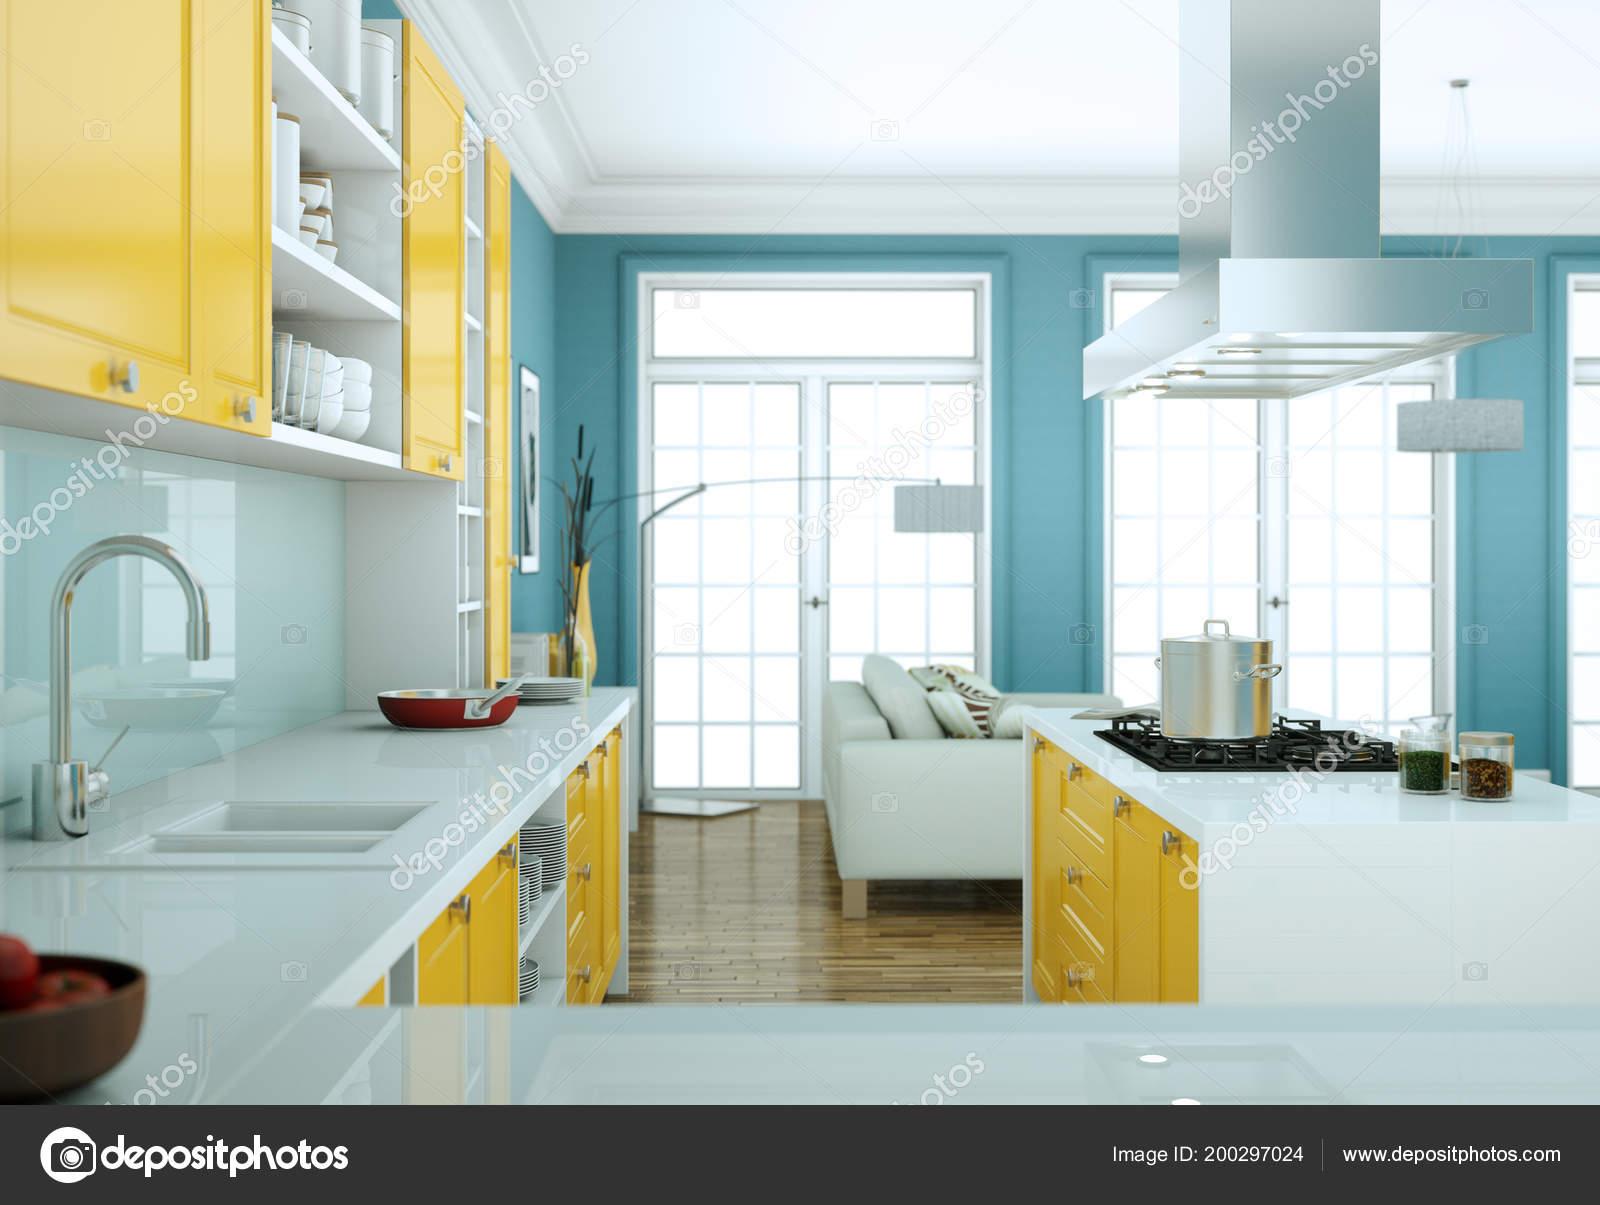 Modern Yellow Kitchen Interior Design Illustration Stock Photo C Virtua73 200297024